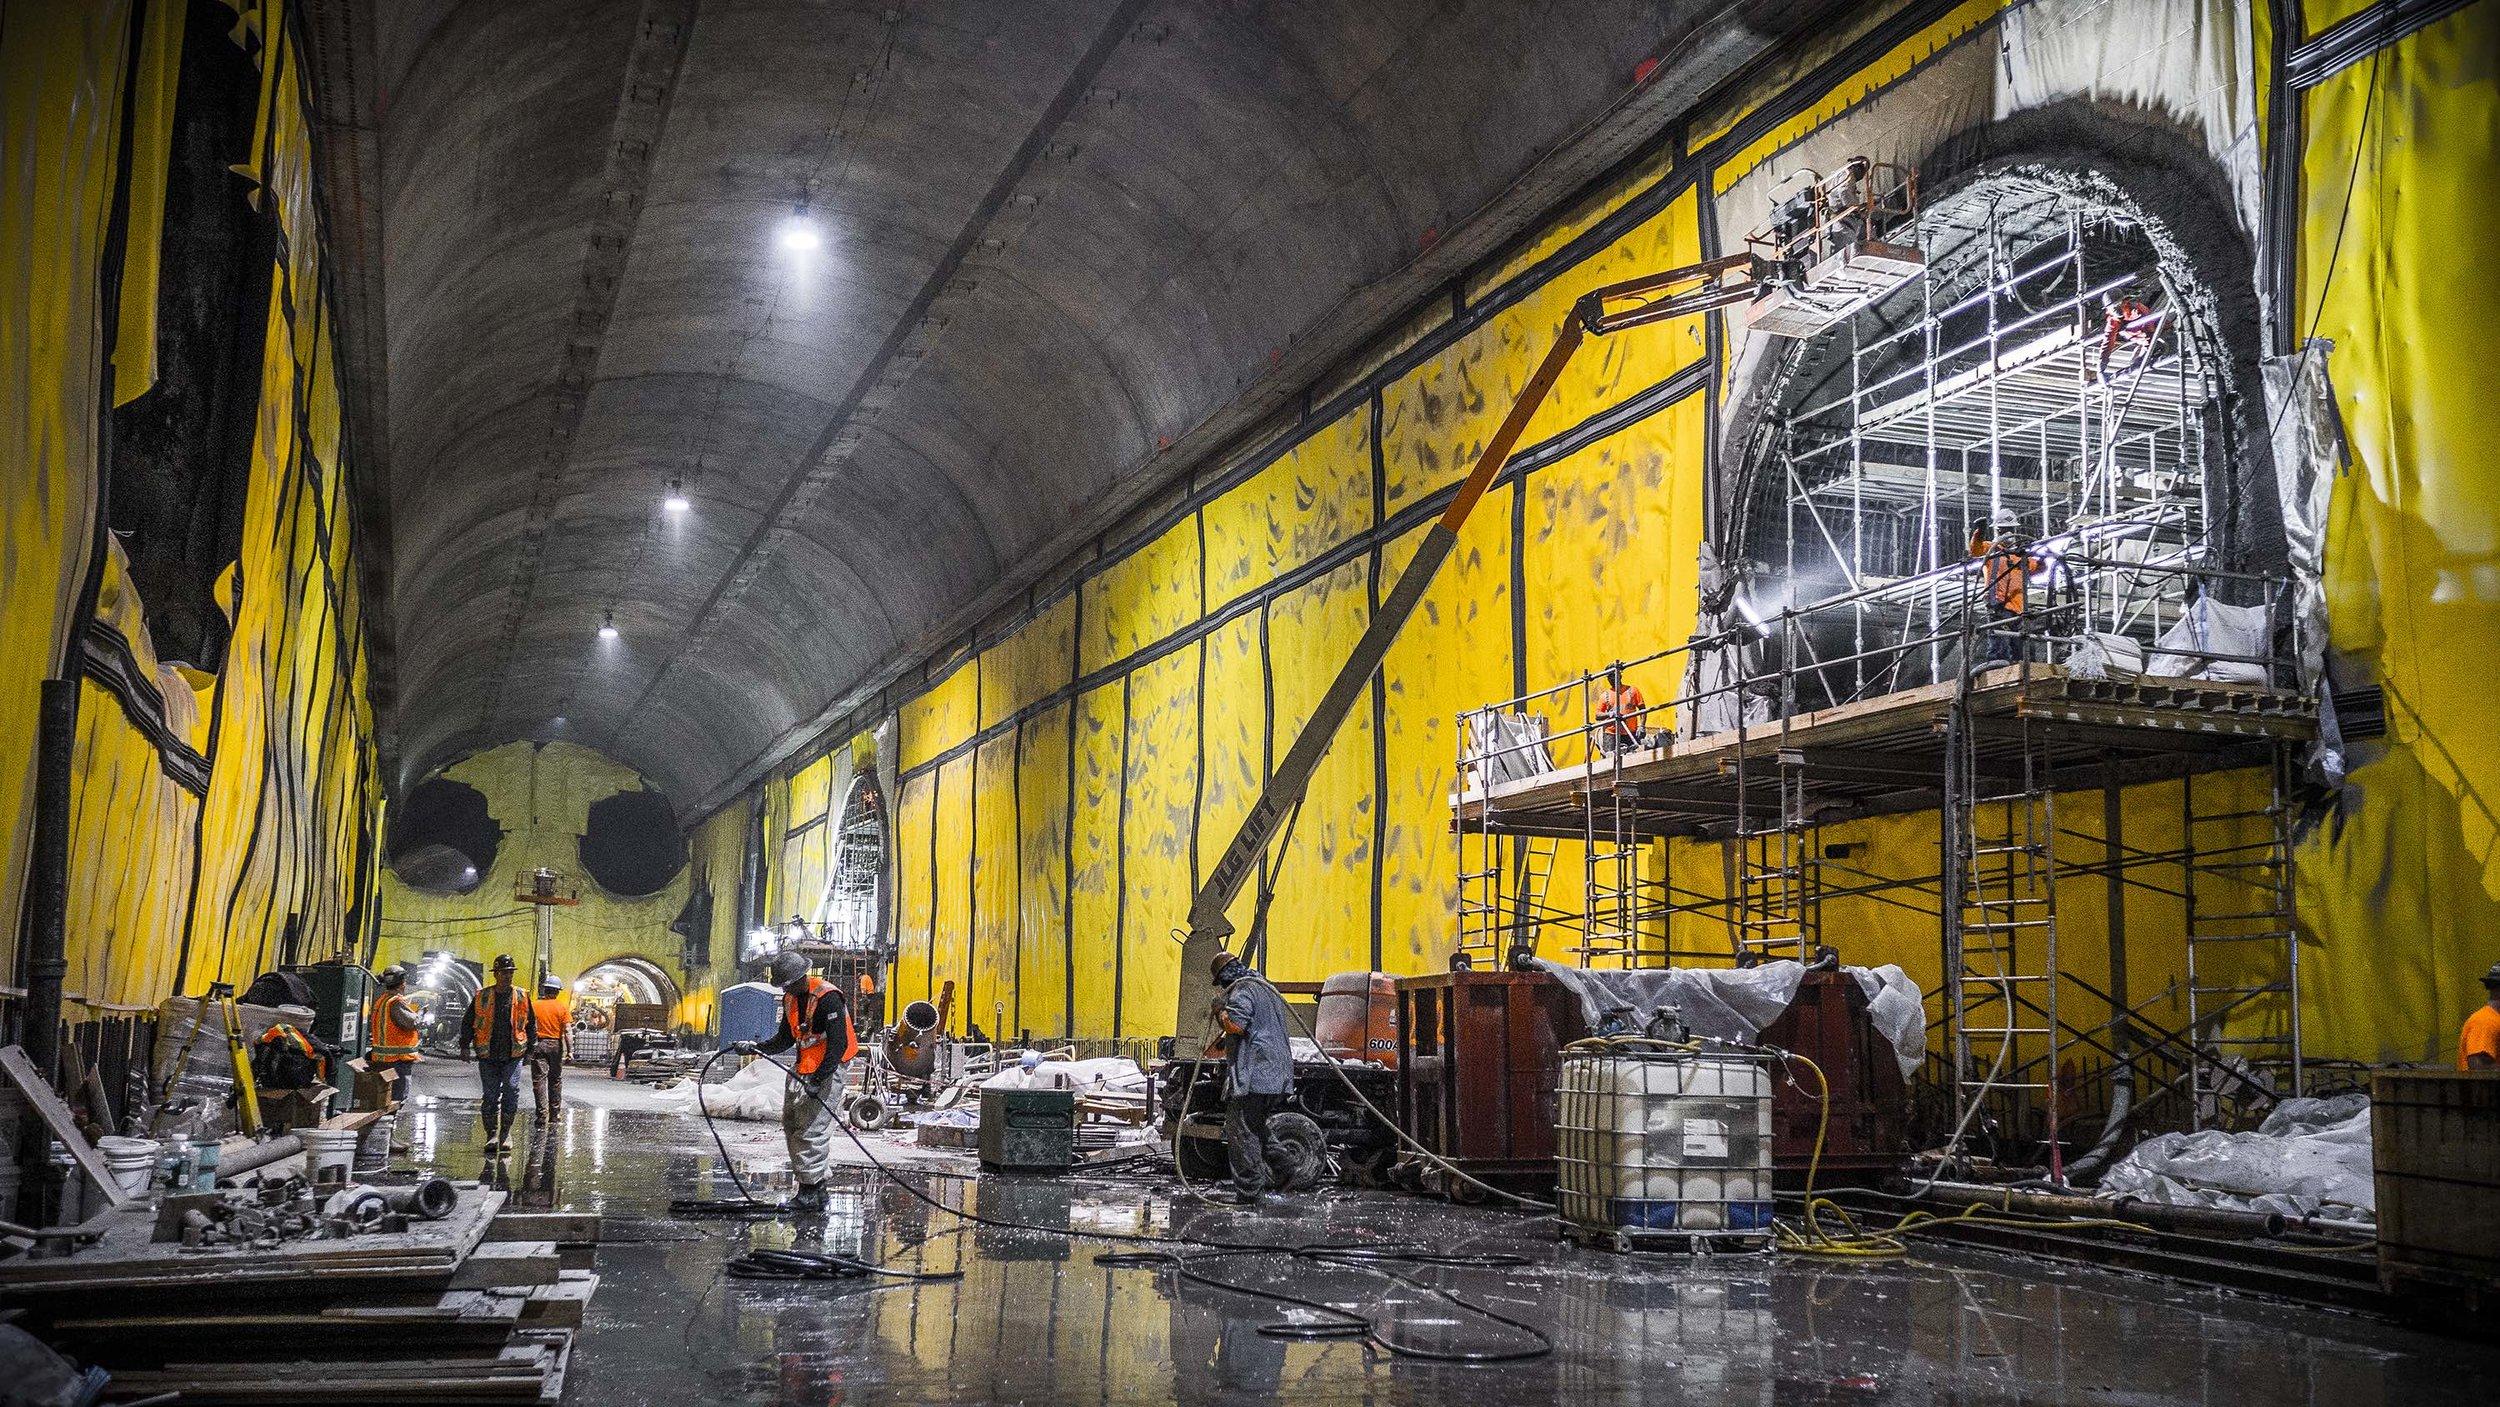 Construction below Grand Central Terminal, May 21, 2014. Credit: MTA Capital Construction / Rehema Trimiew.